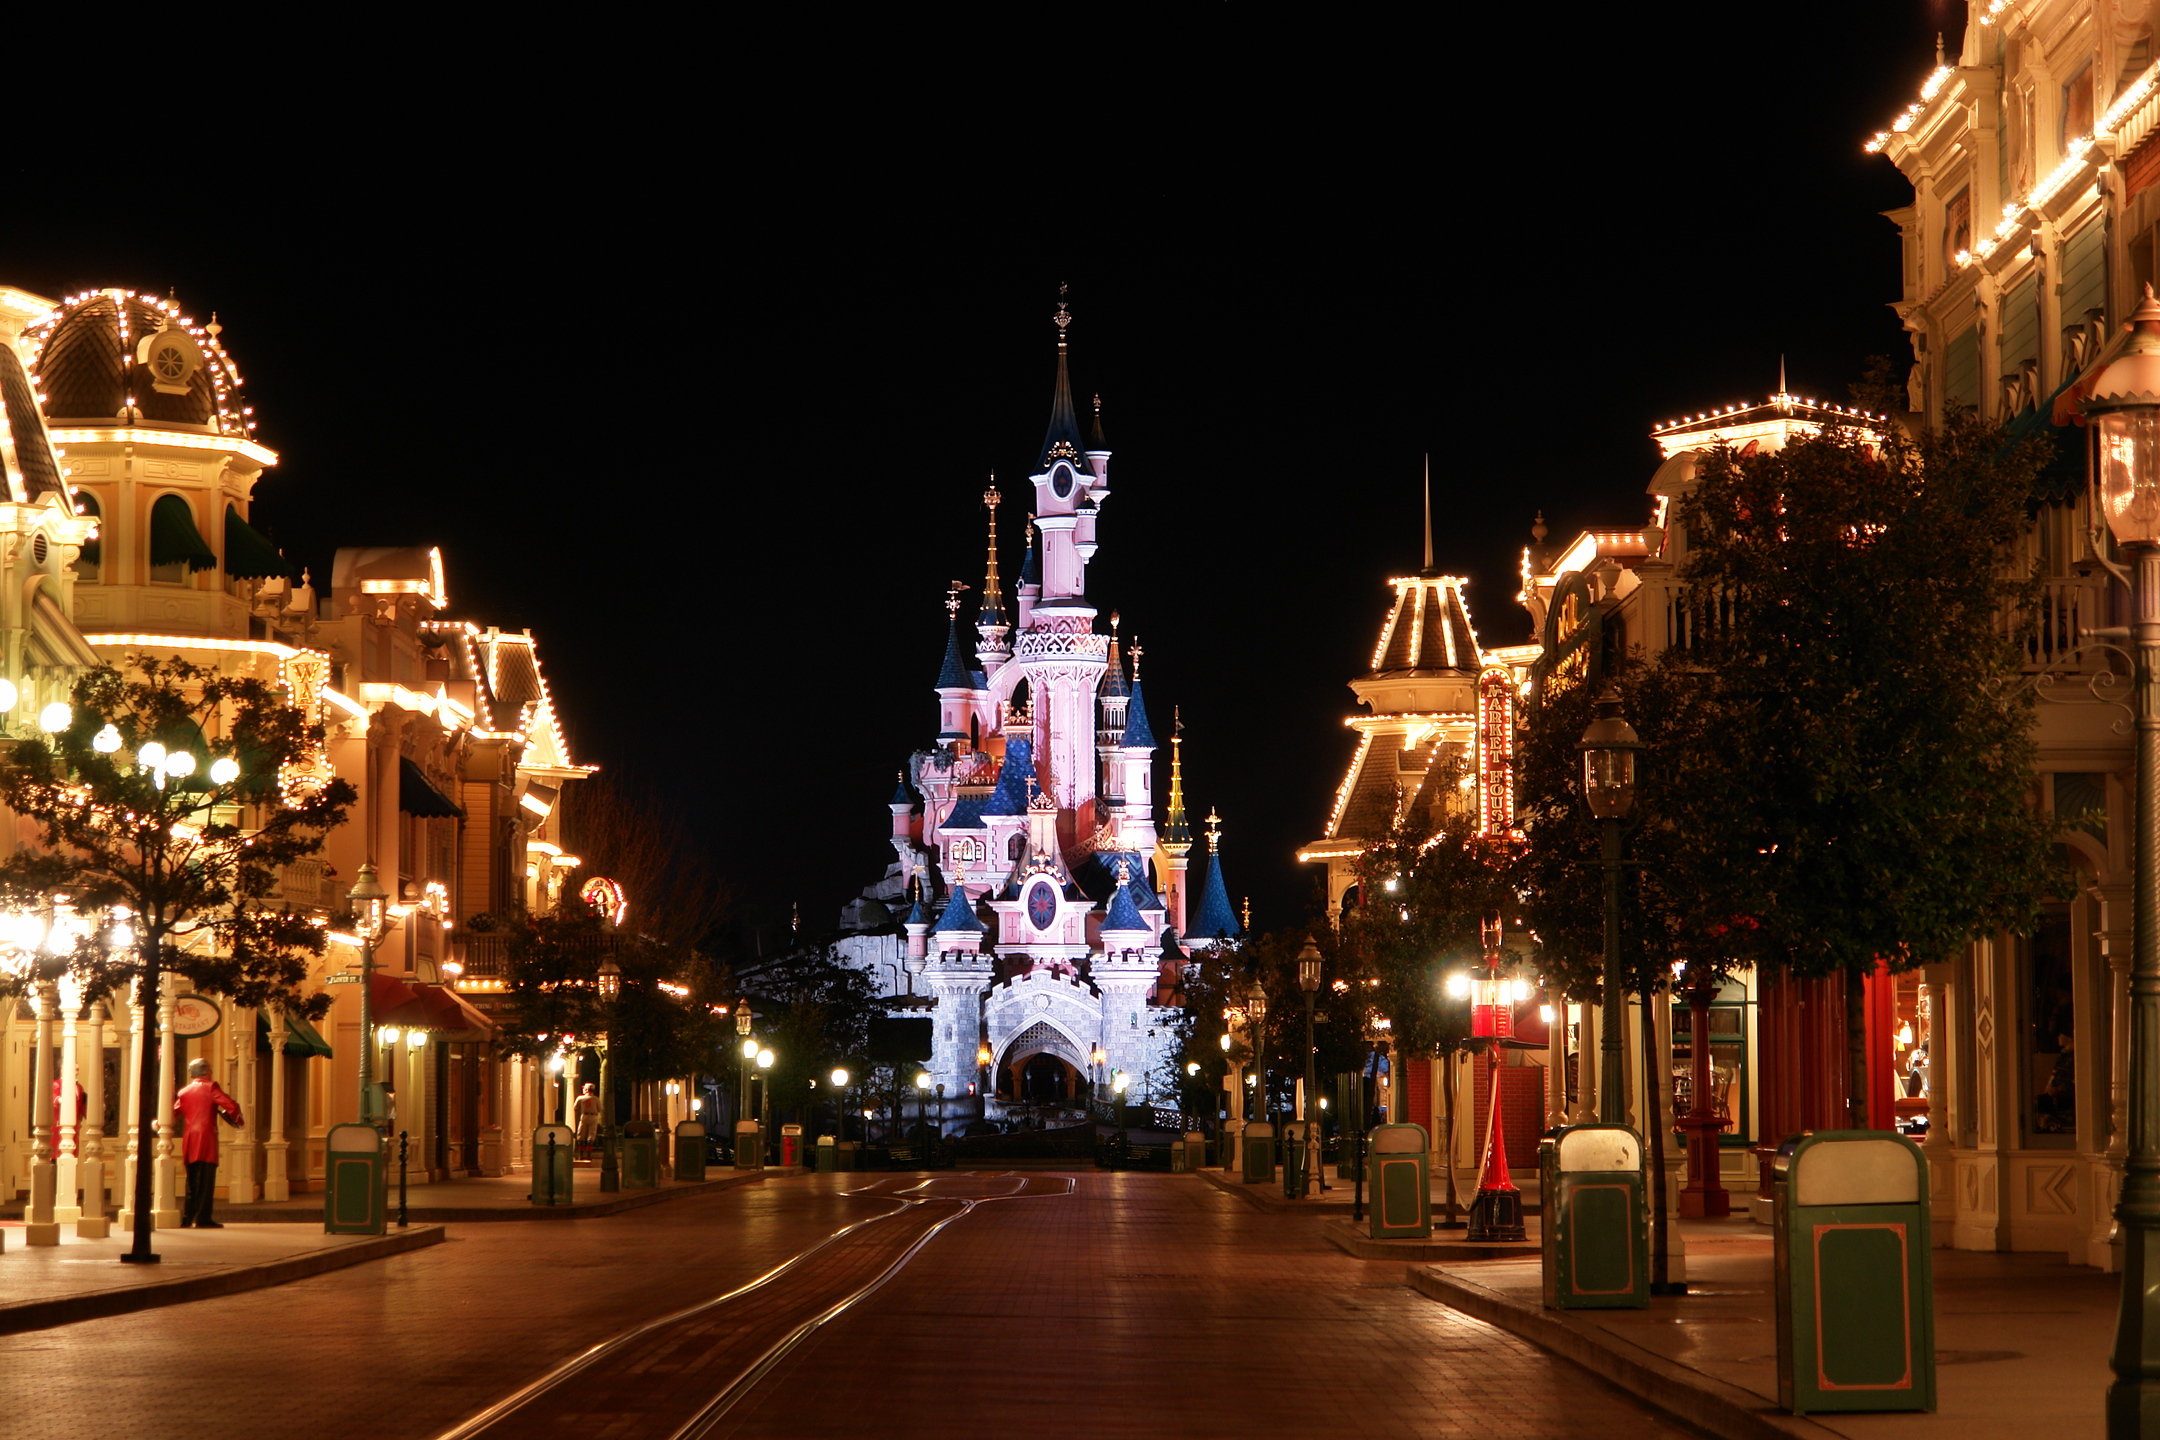 Main Street - Disneyland Paris  Paris, France   Click to view project.